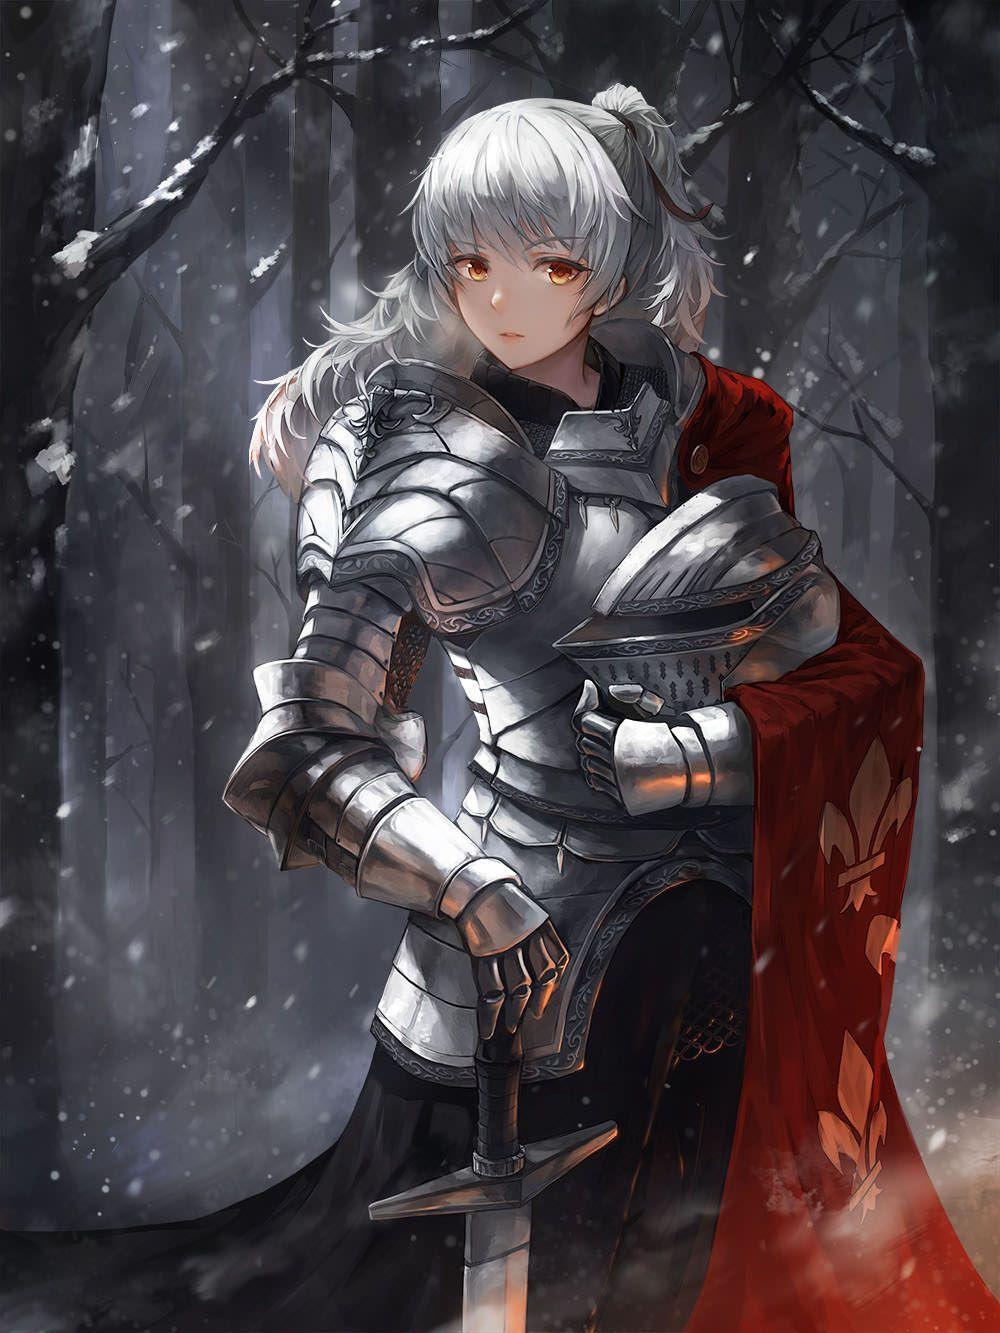 Armored Women Anime warrior, Female knight, Anime